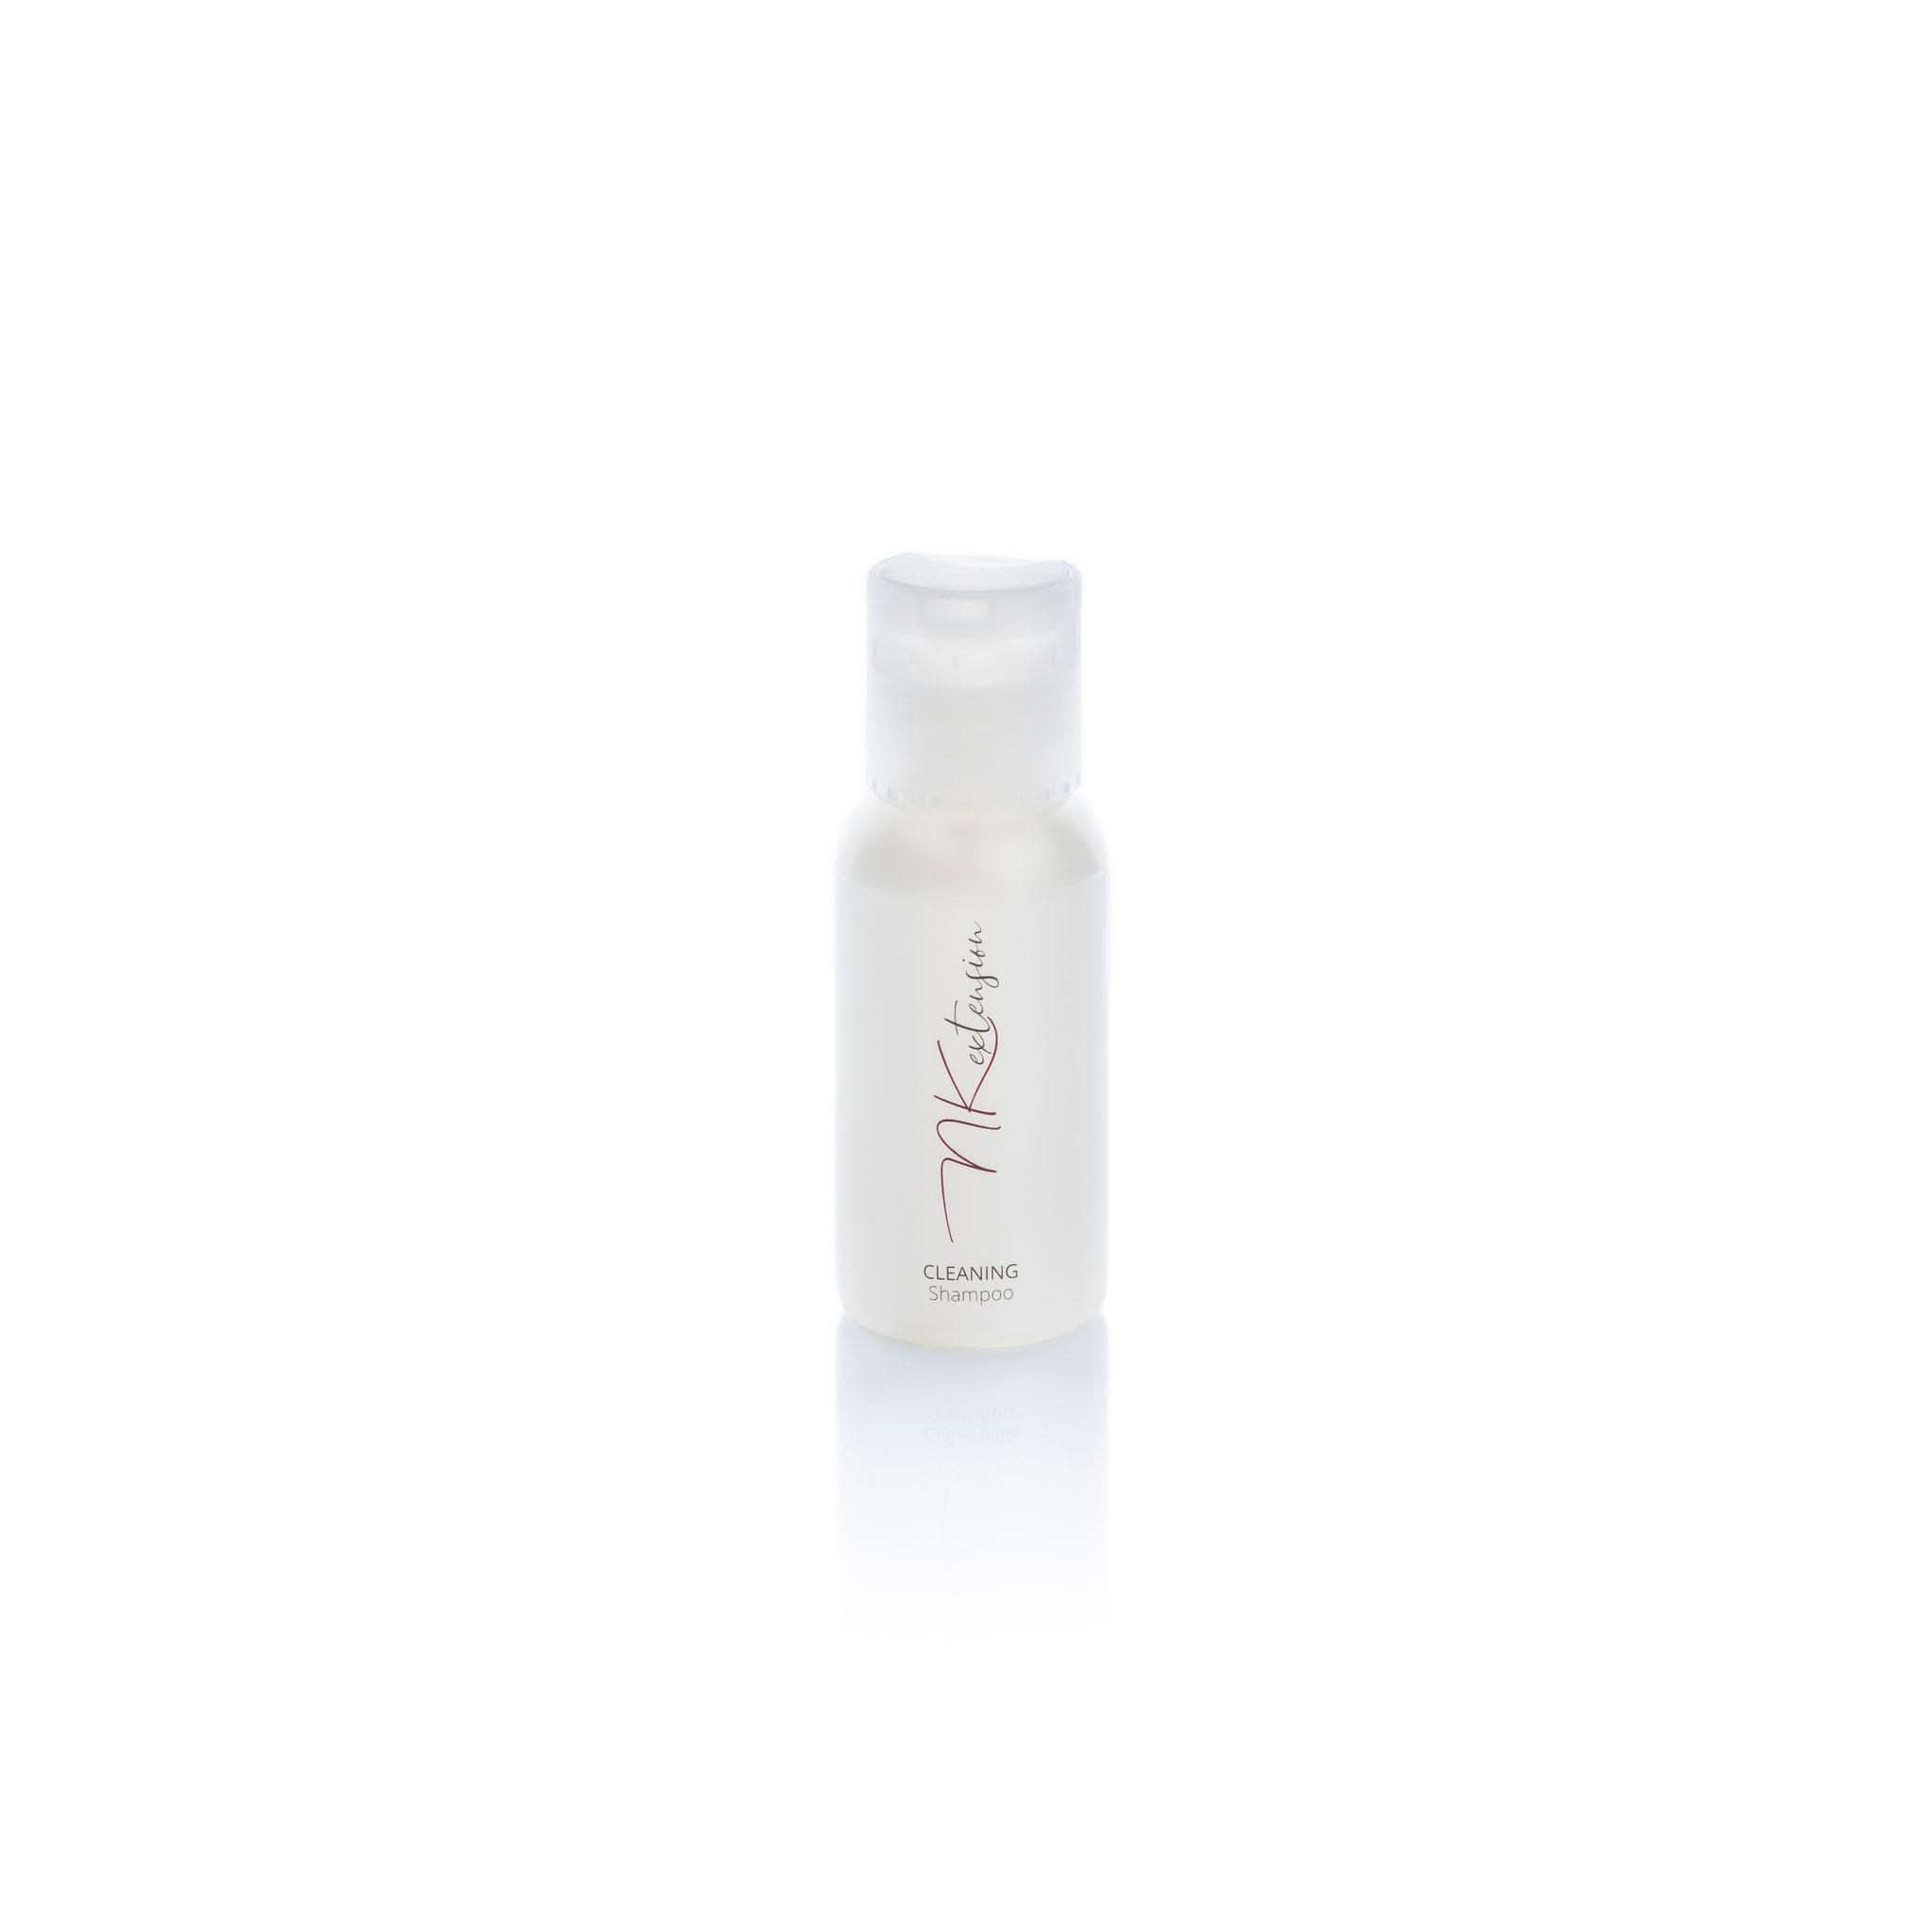 Cleaning Shampoo 50ml